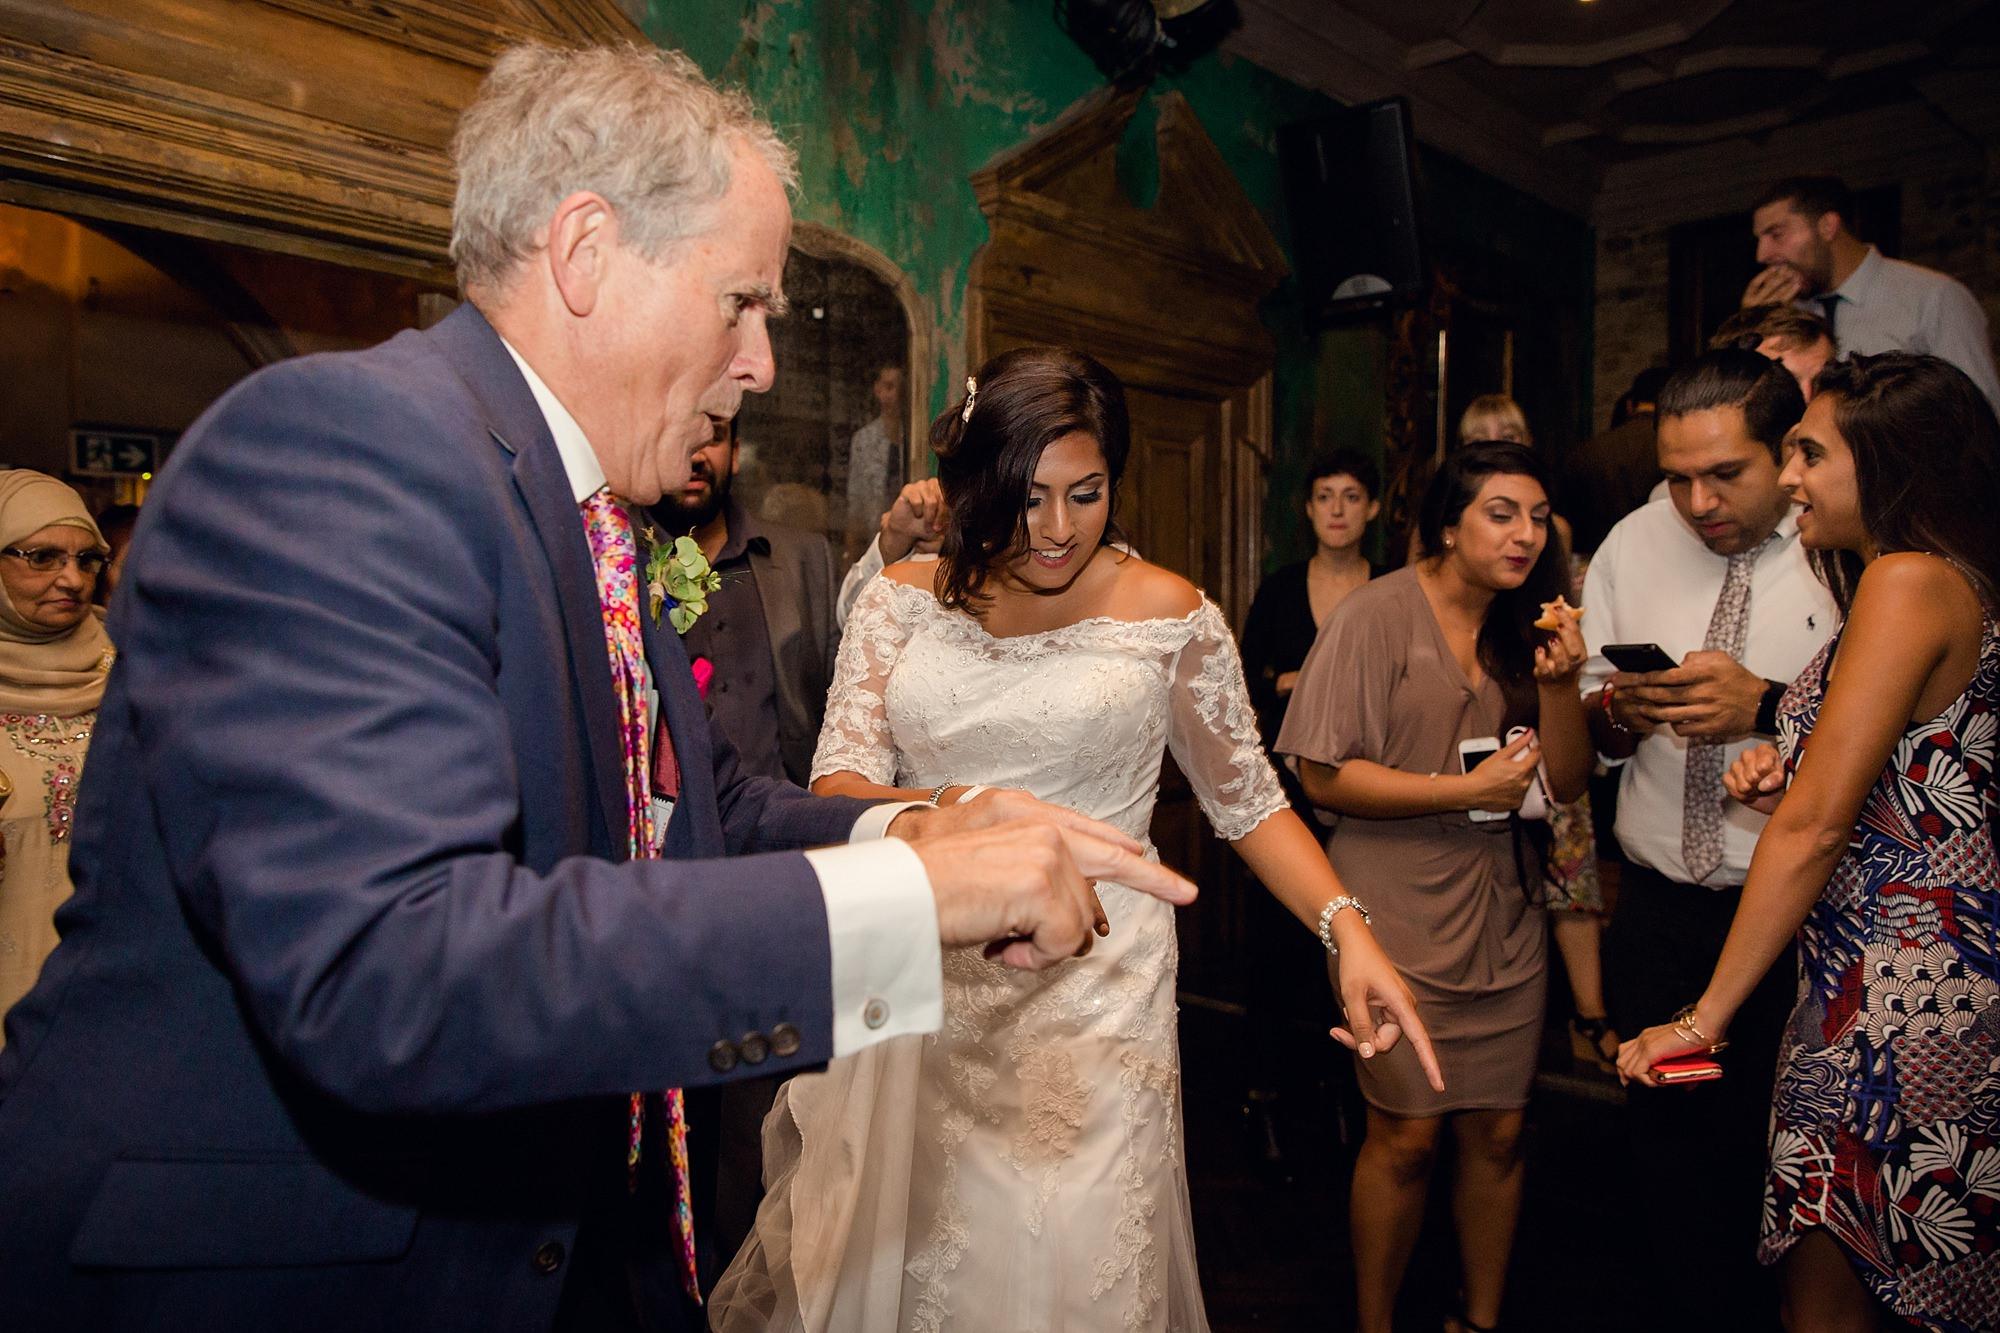 Paradise by way of Kensal Green wedding bride dancing